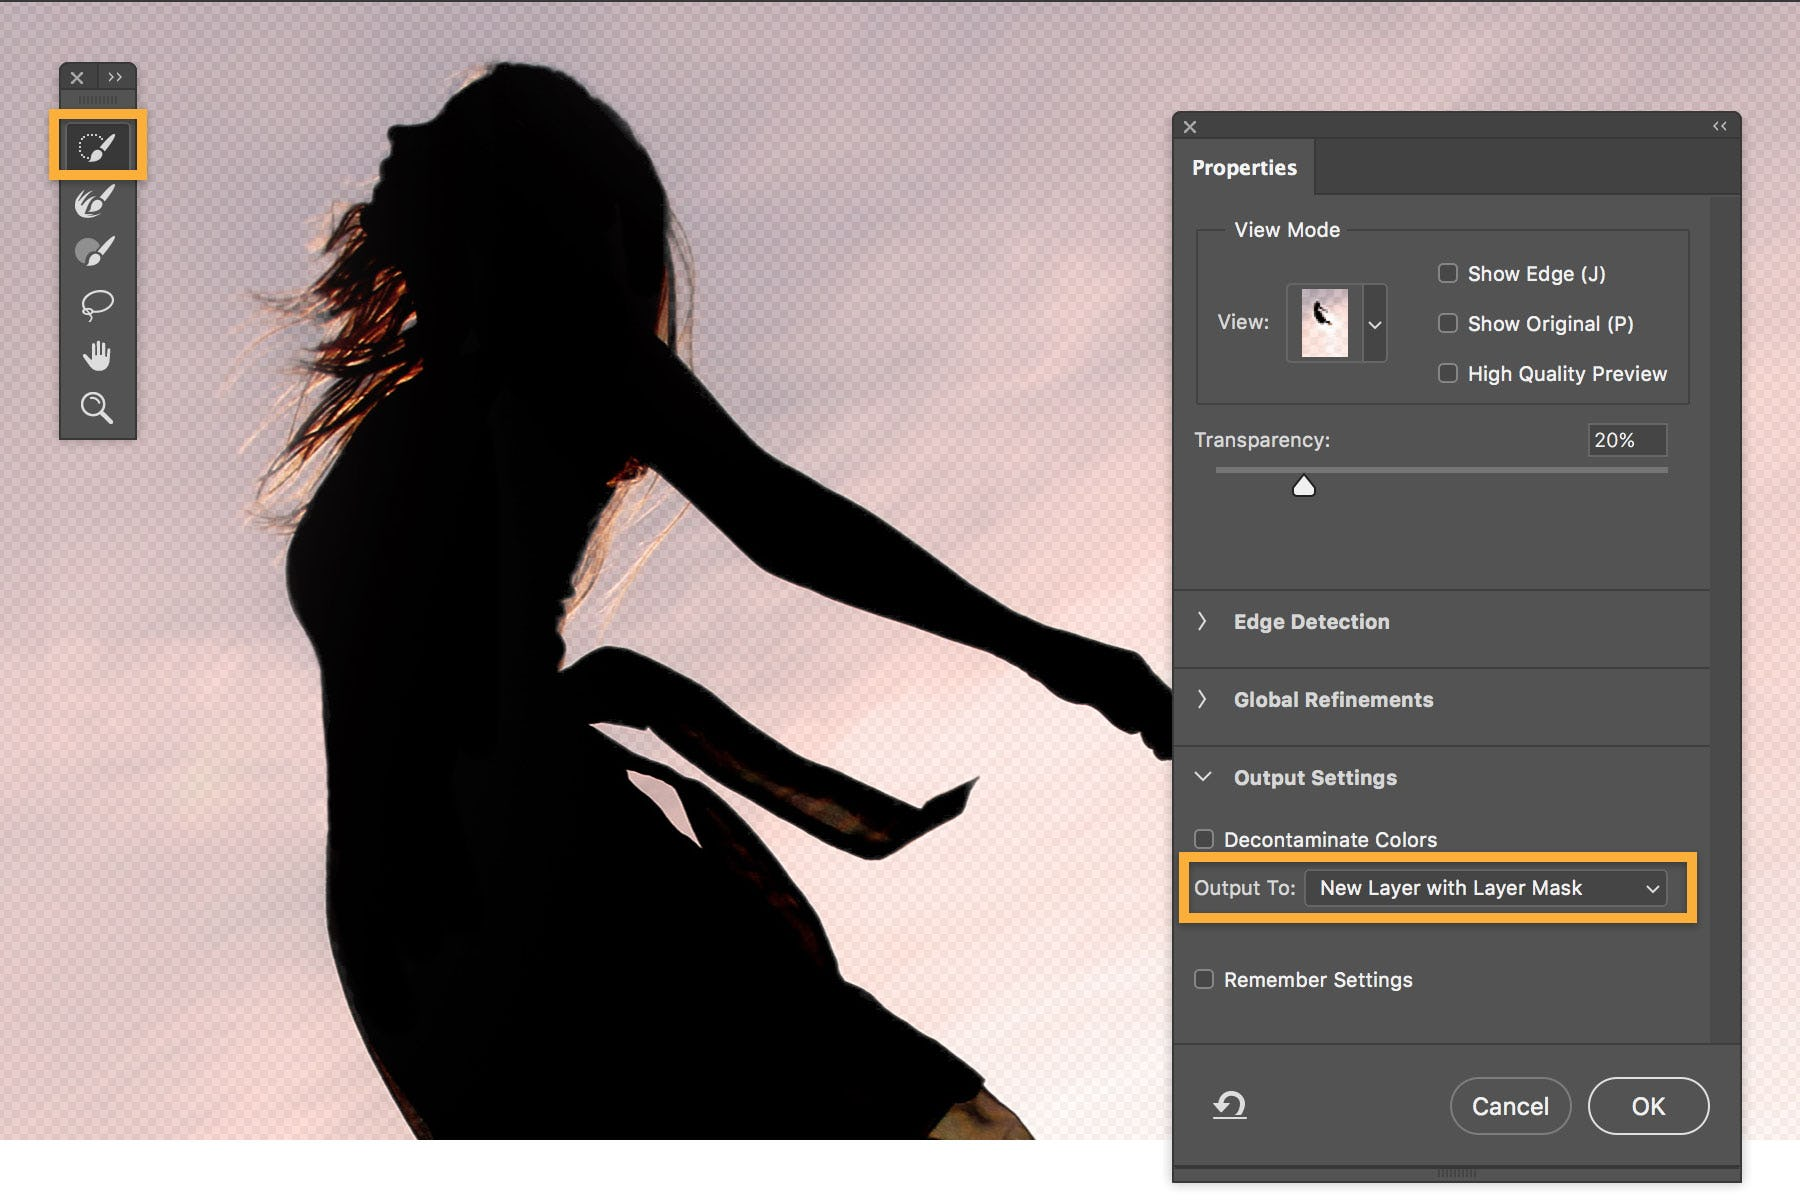 Adobe Photoshop Logiciel - 2